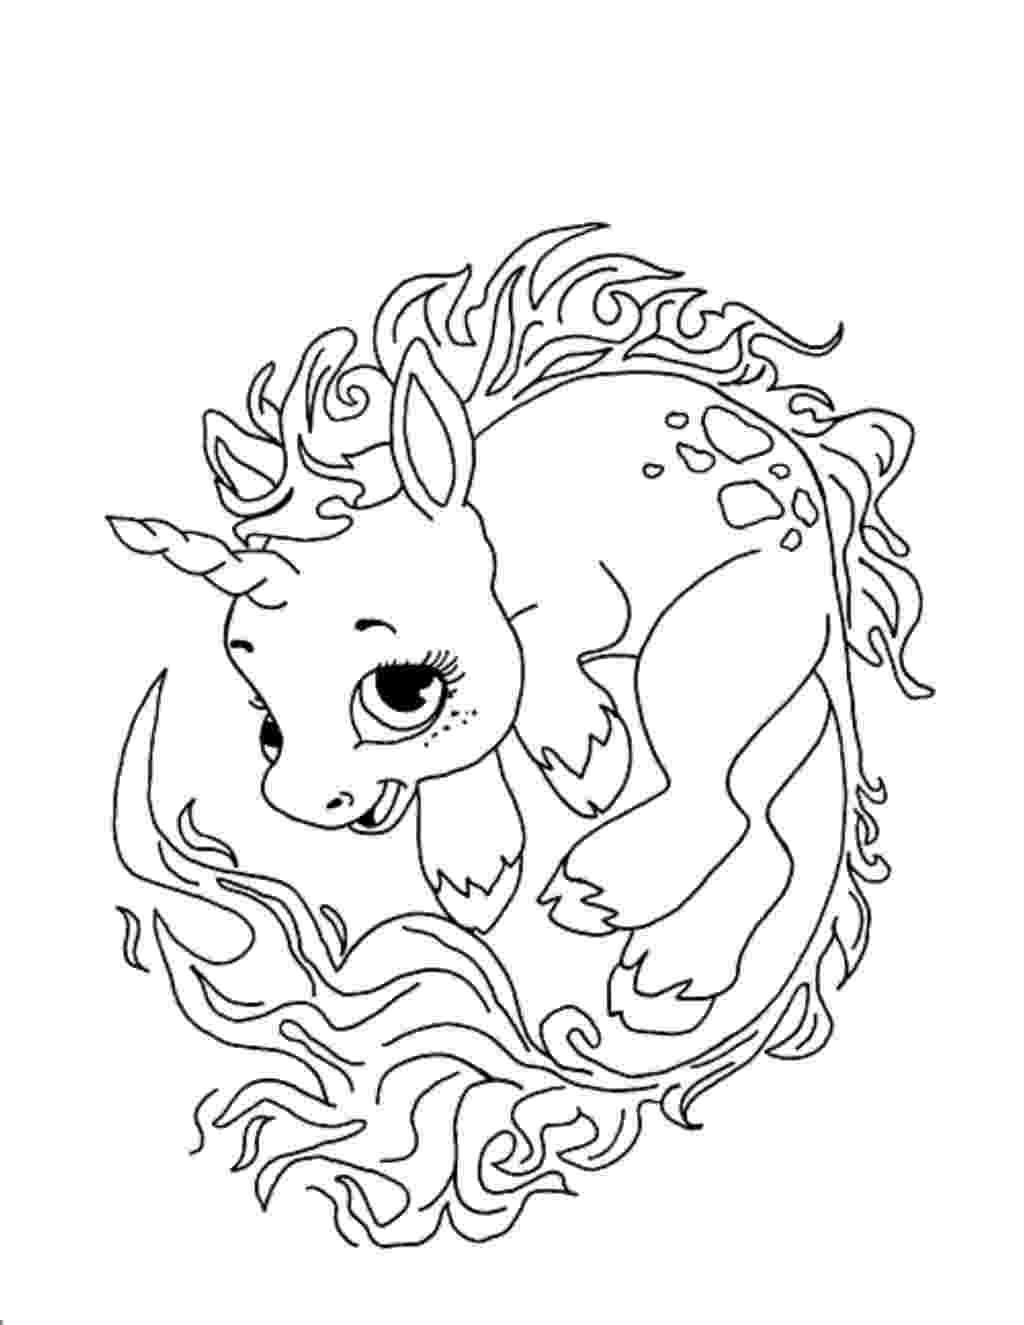 cute unicorn coloring pages cute baby unicorn coloring page free printable coloring pages cute coloring unicorn